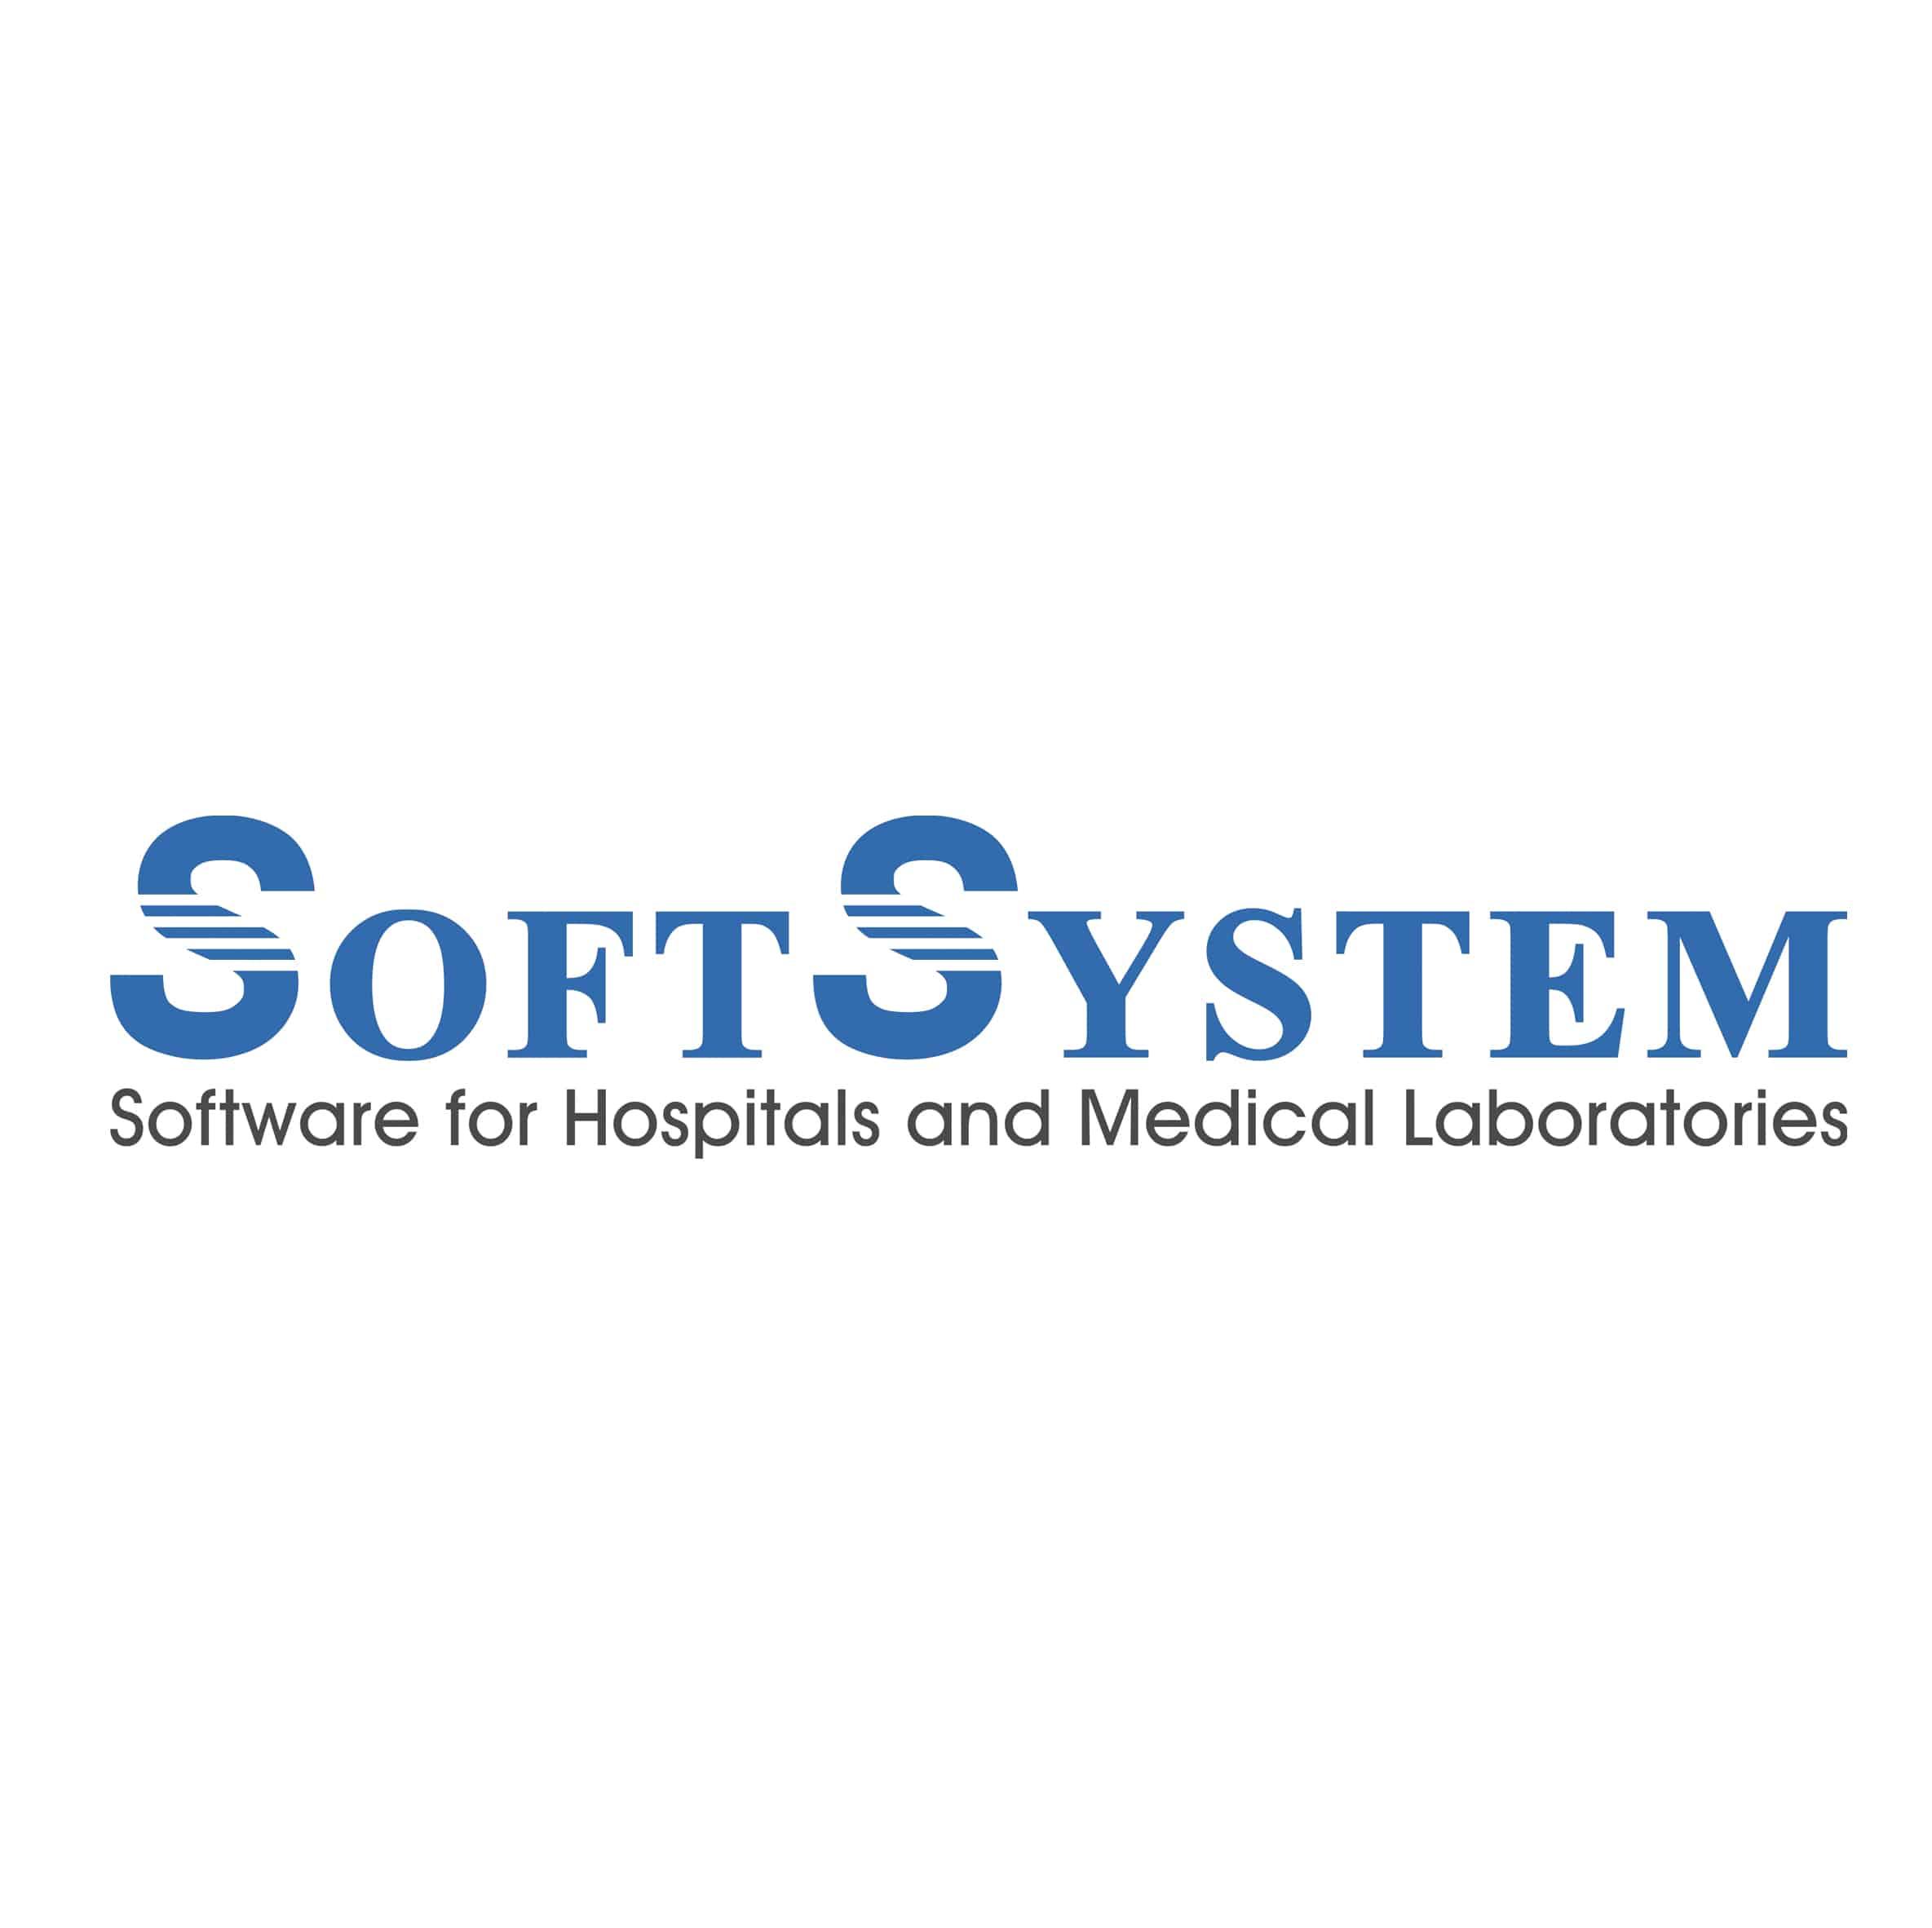 softsystem